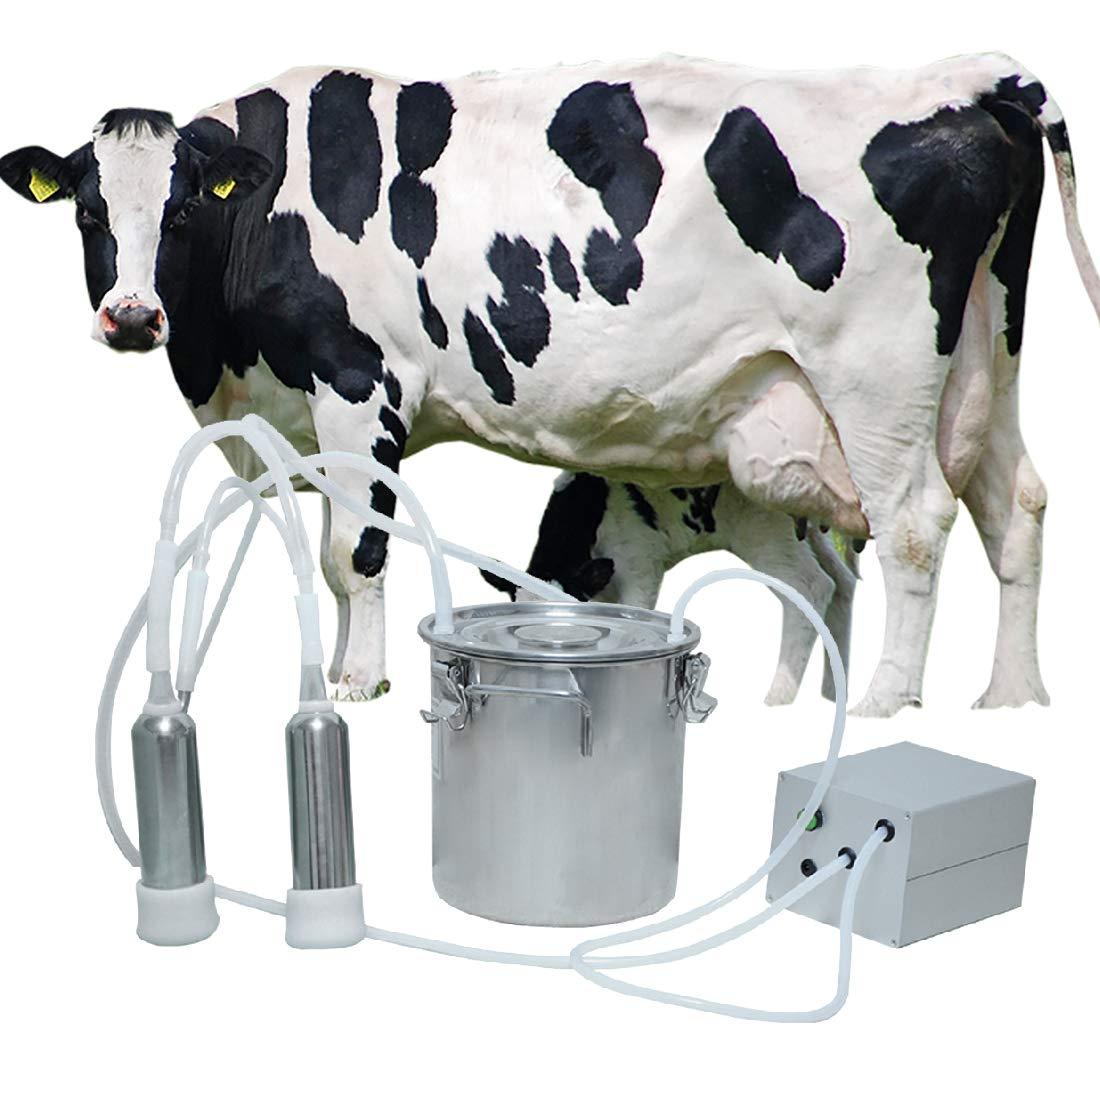 BEETLA Electric Pulsation Milking Machine   5L Portable Vacuum-Pulse Pump Cow Milking Machine with 2 Teat Milker   Suction Milker Vacuum Pump with Automatic Stop Device by BEETLA